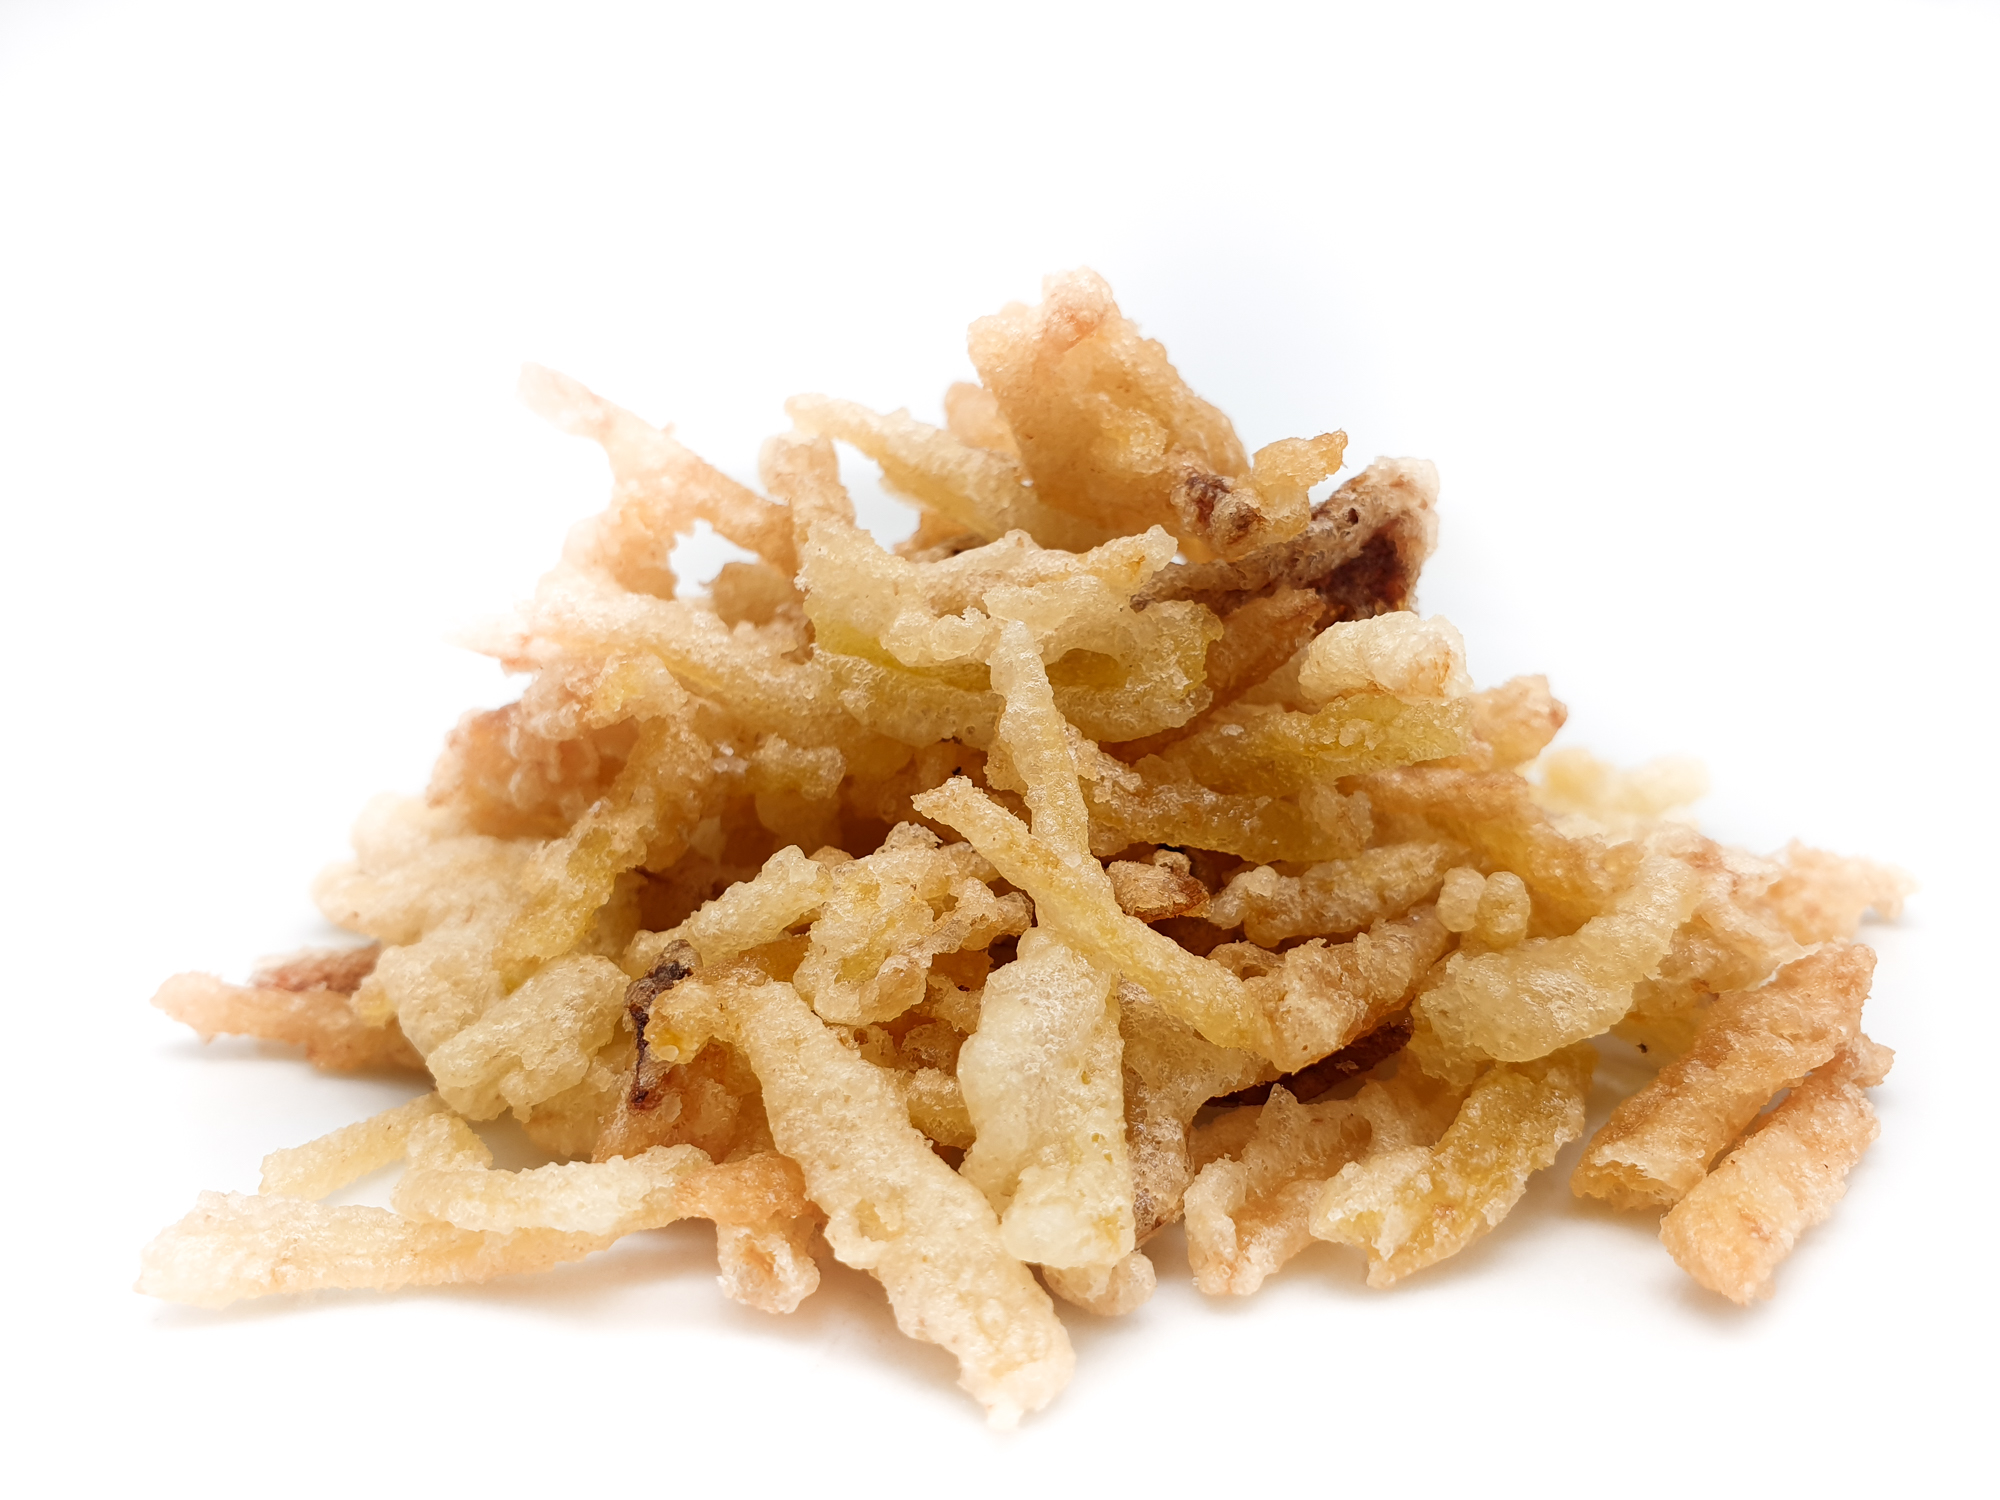 Cebolla y patata tempura fina